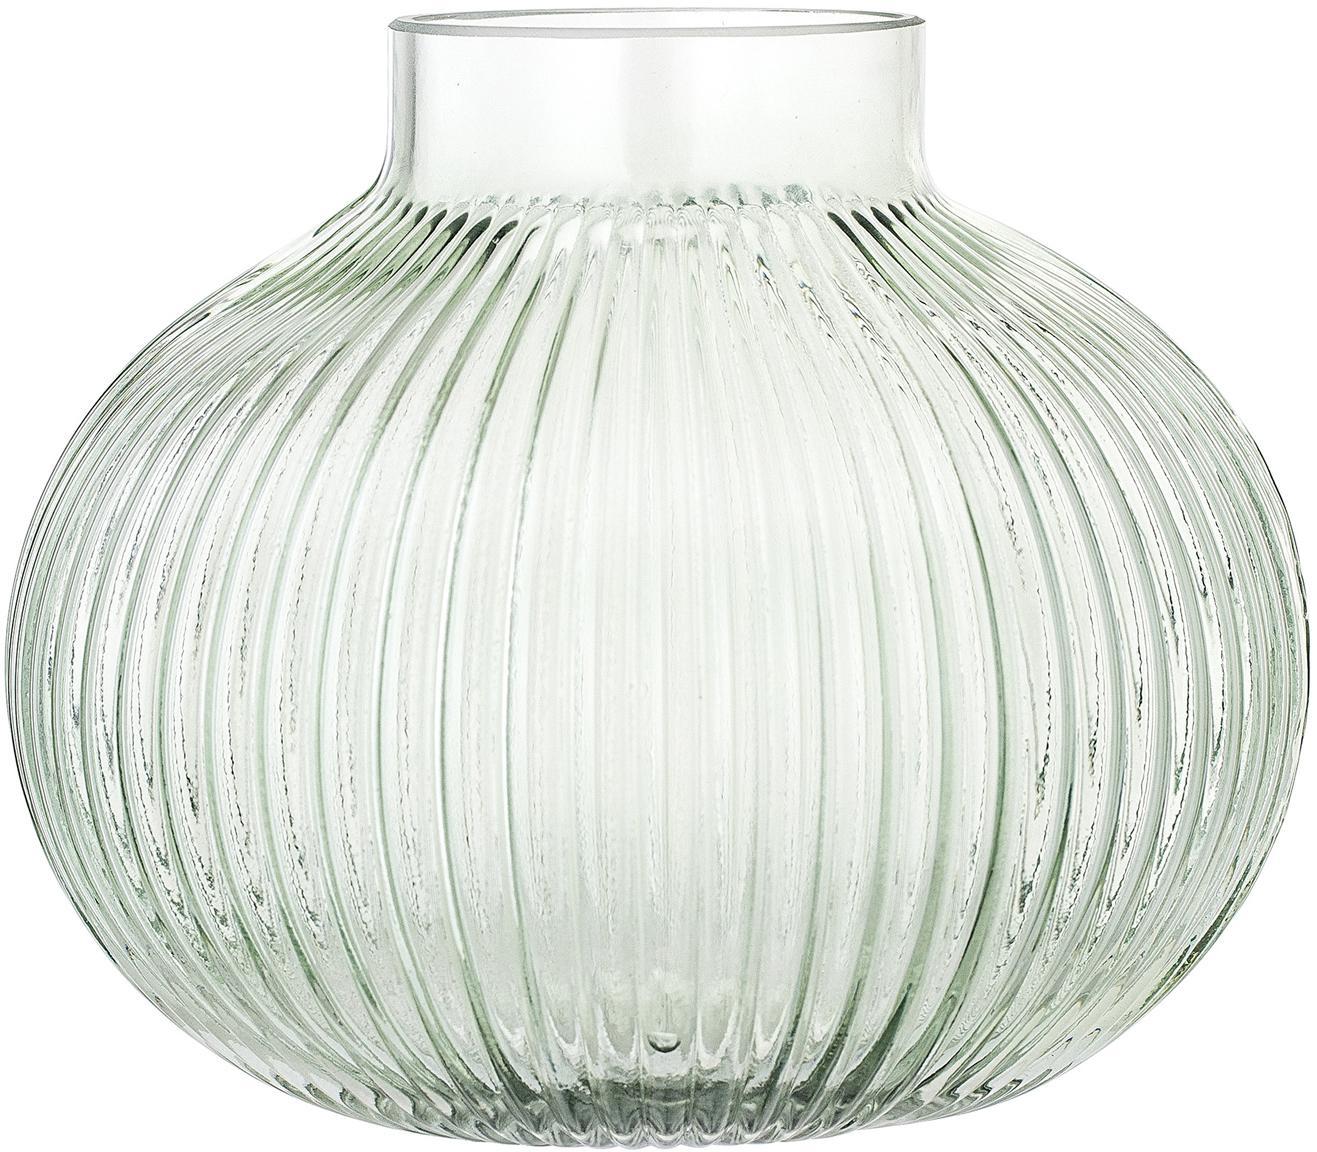 Jarrón pequeño Gola, Vidrio, Verde claro transparente, Ø 16 x Al 15 cm